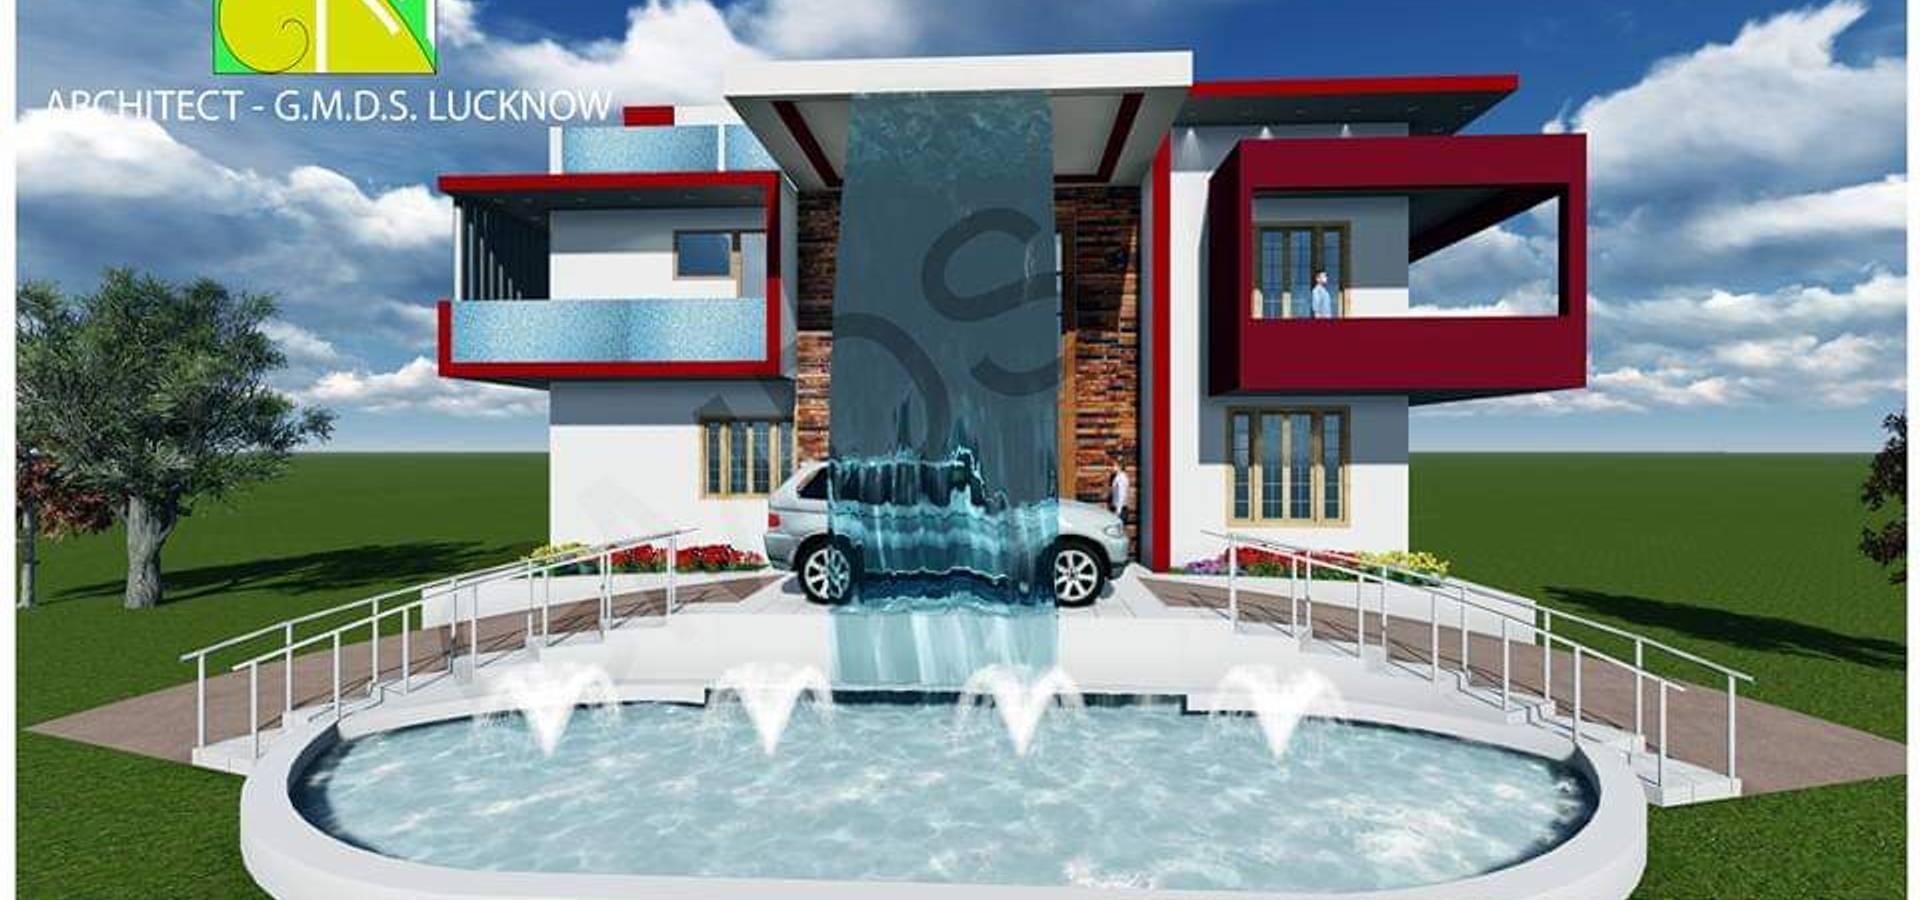 GMDS Gyan Manjusha Design Studio